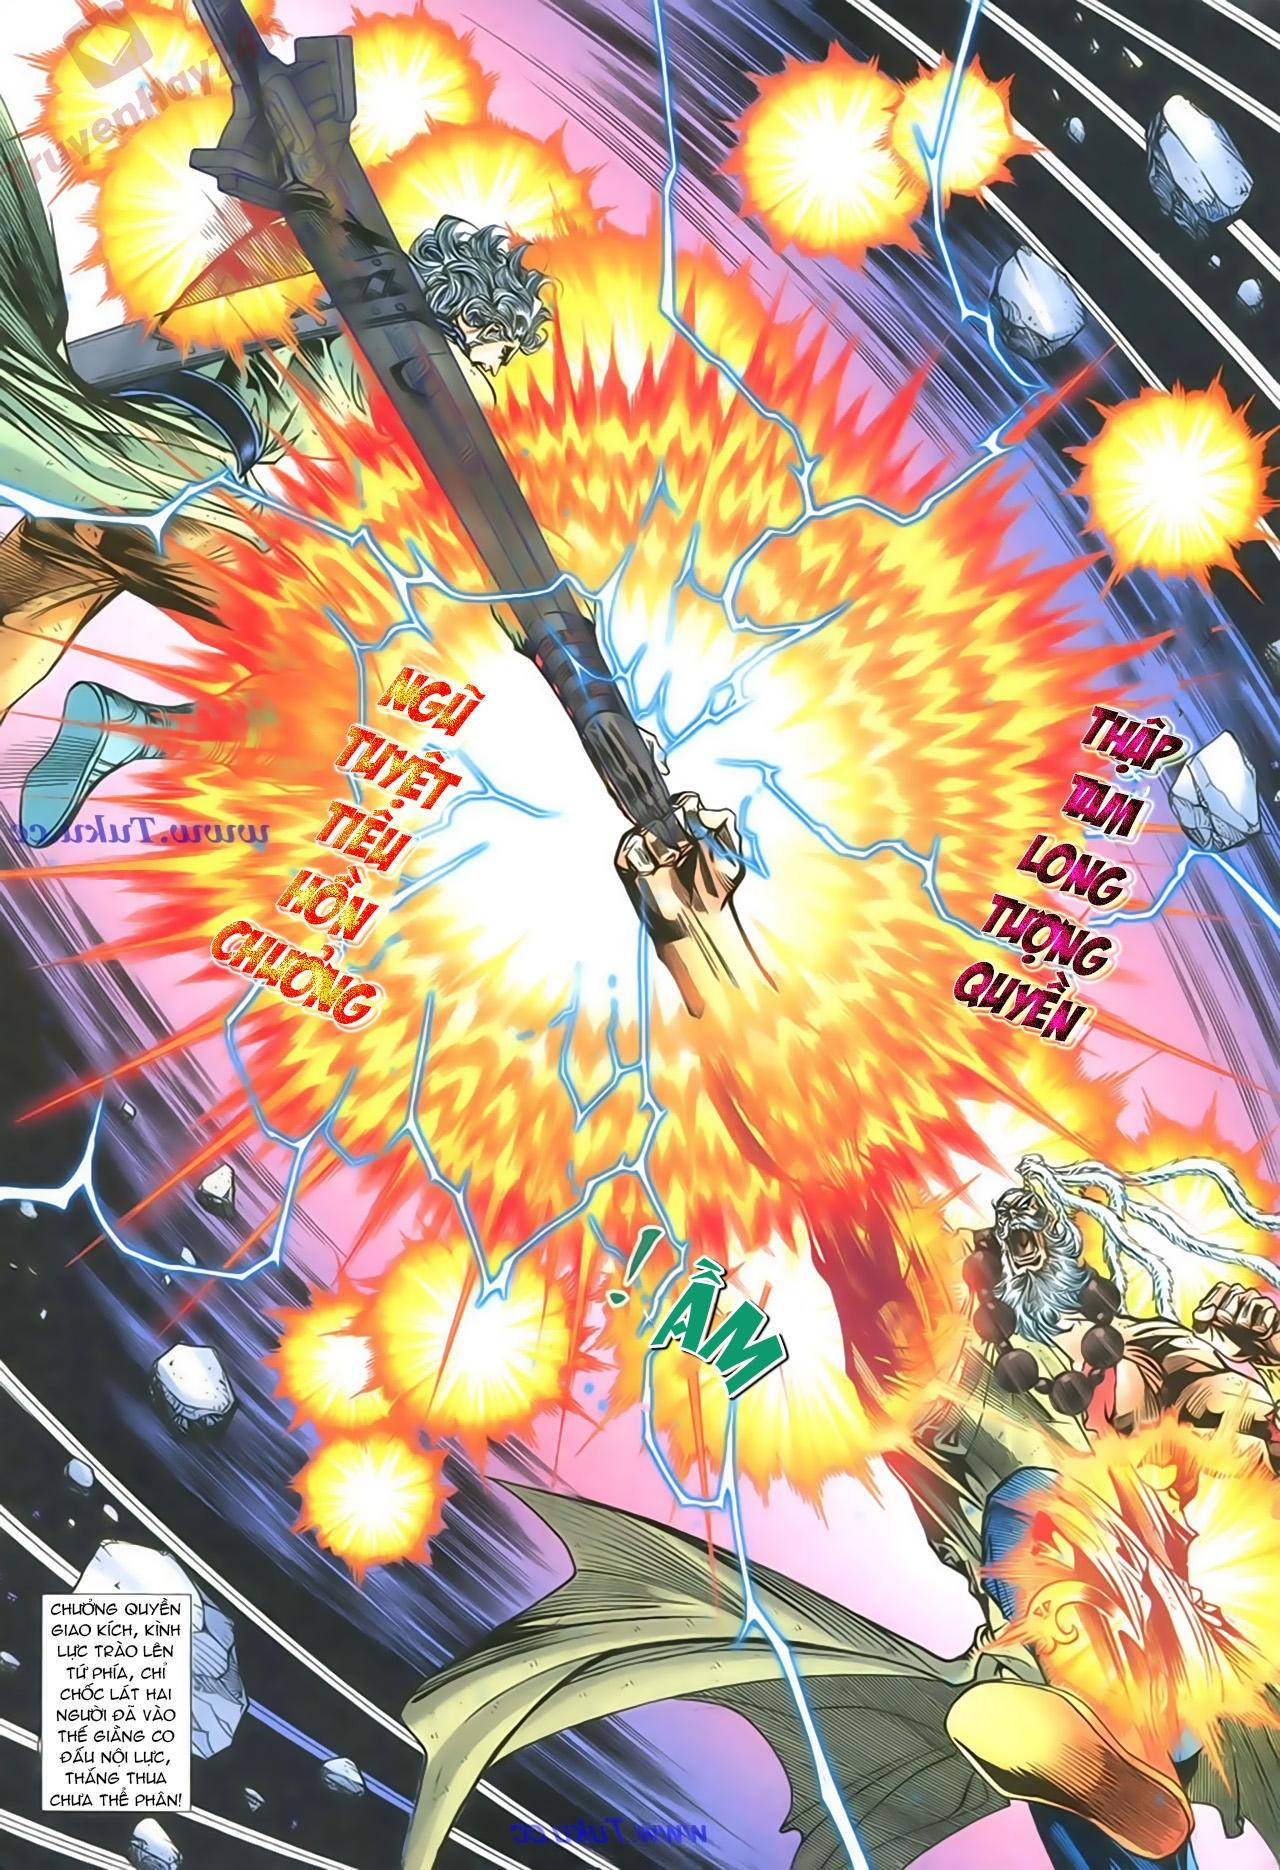 Thần Điêu Hiệp Lữ chap 86 – End Trang 20 - Mangak.info